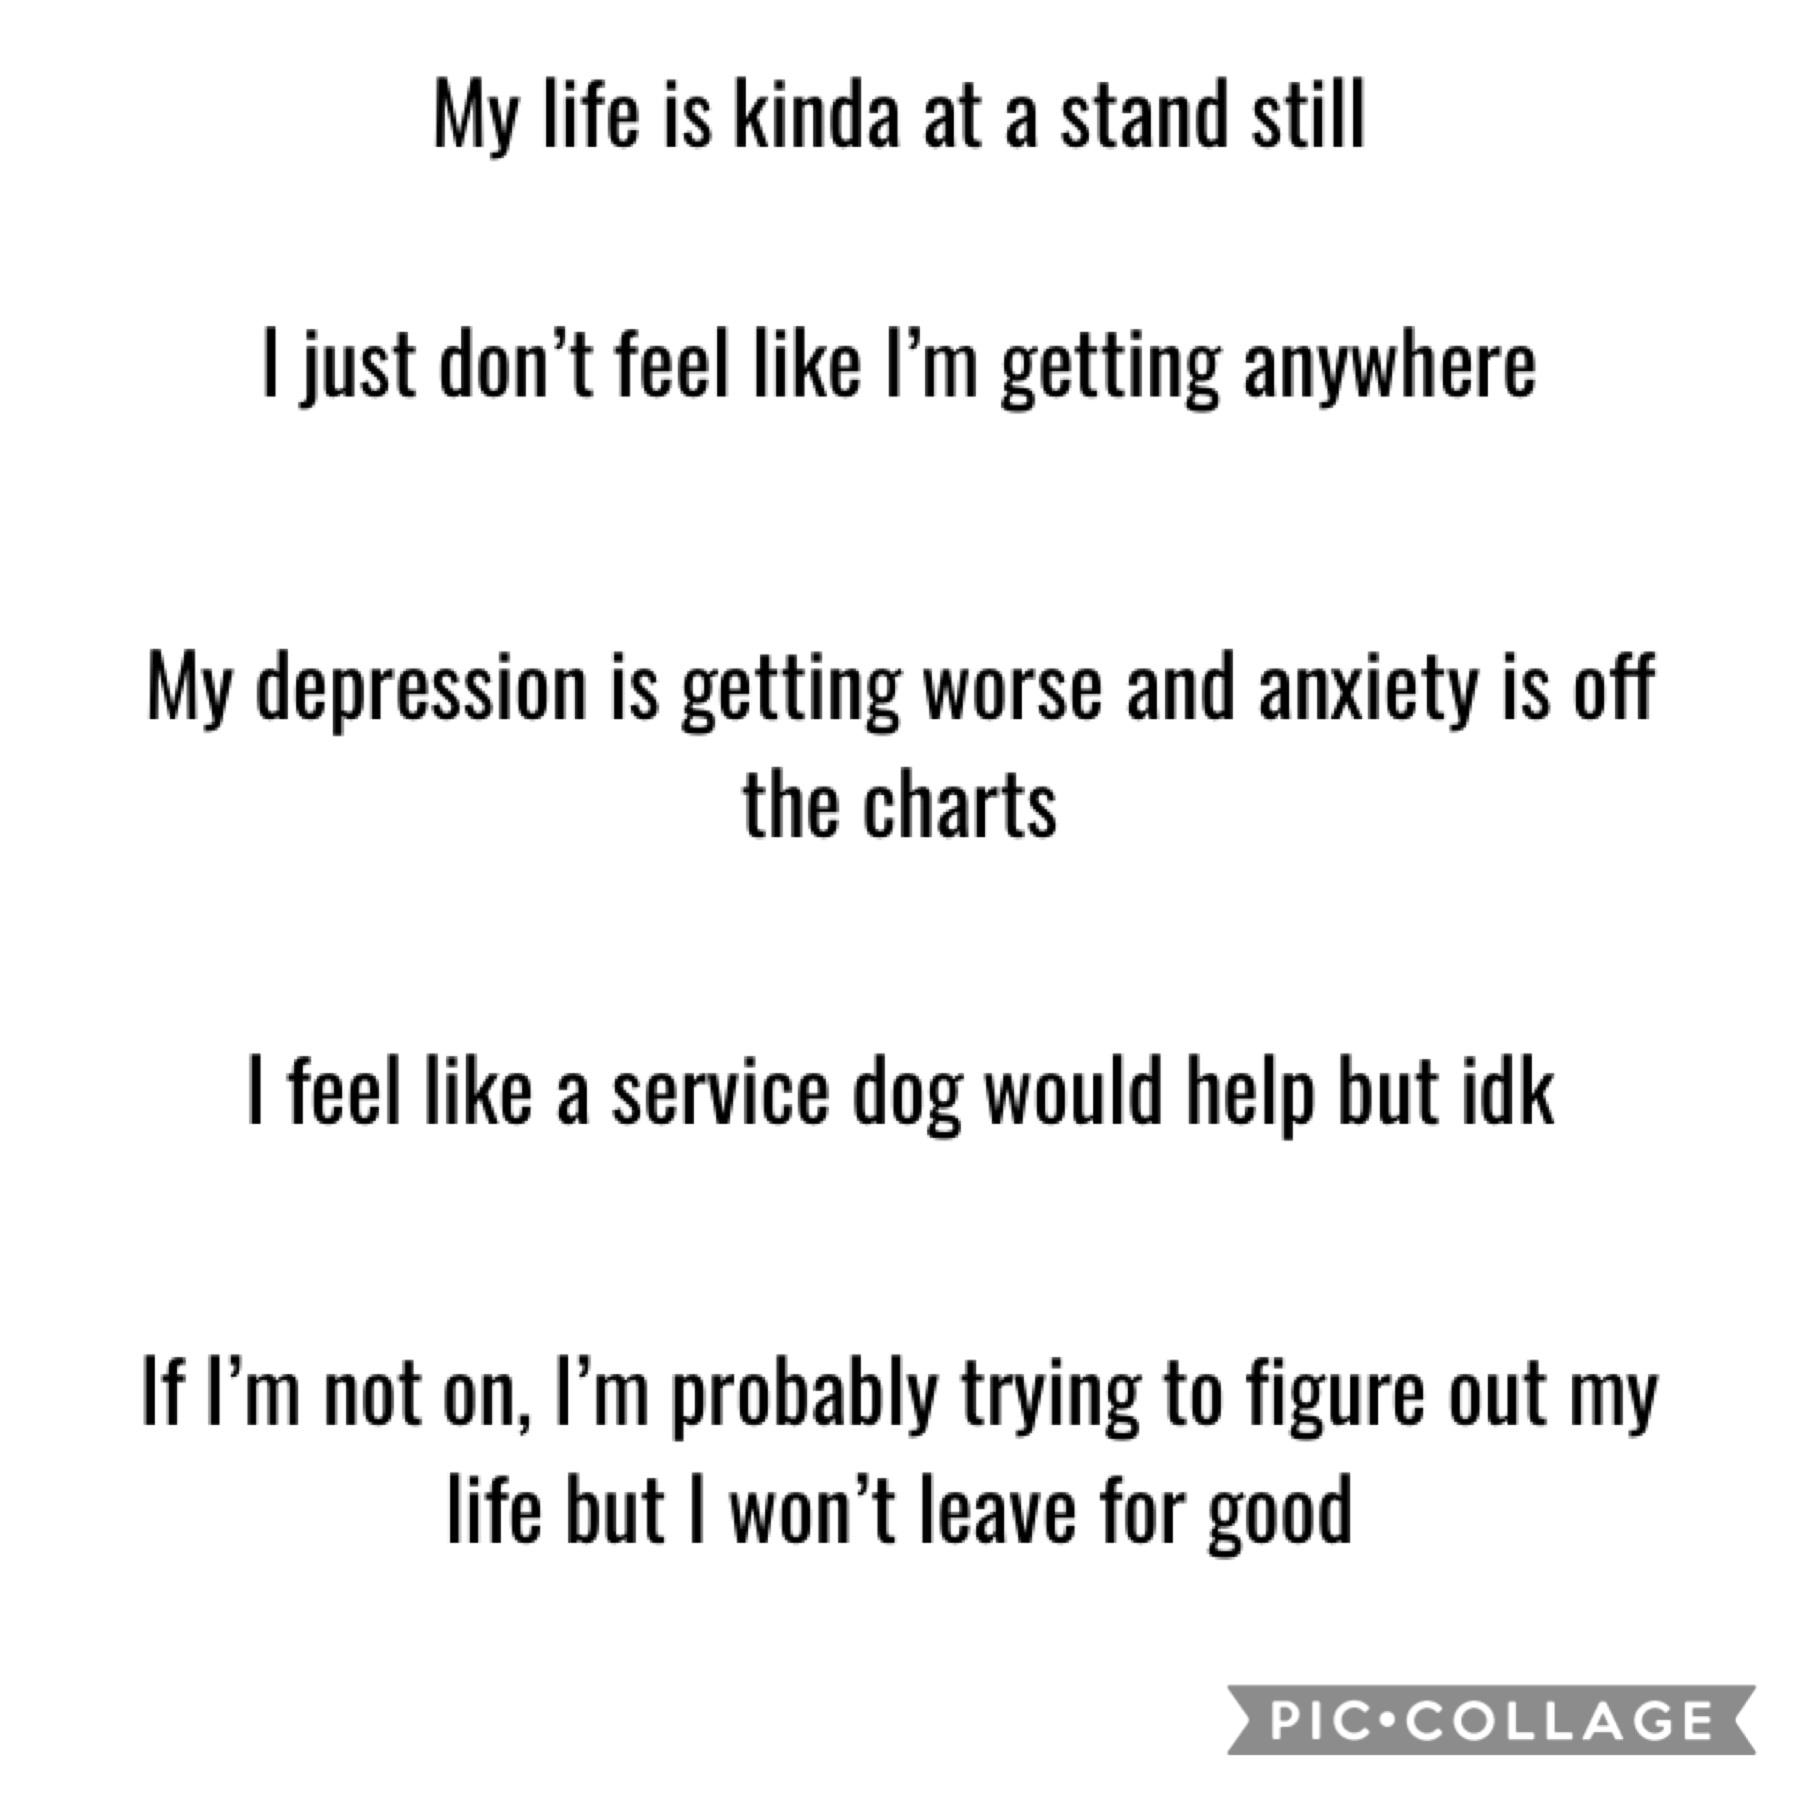 My life...🙁 depression sucks